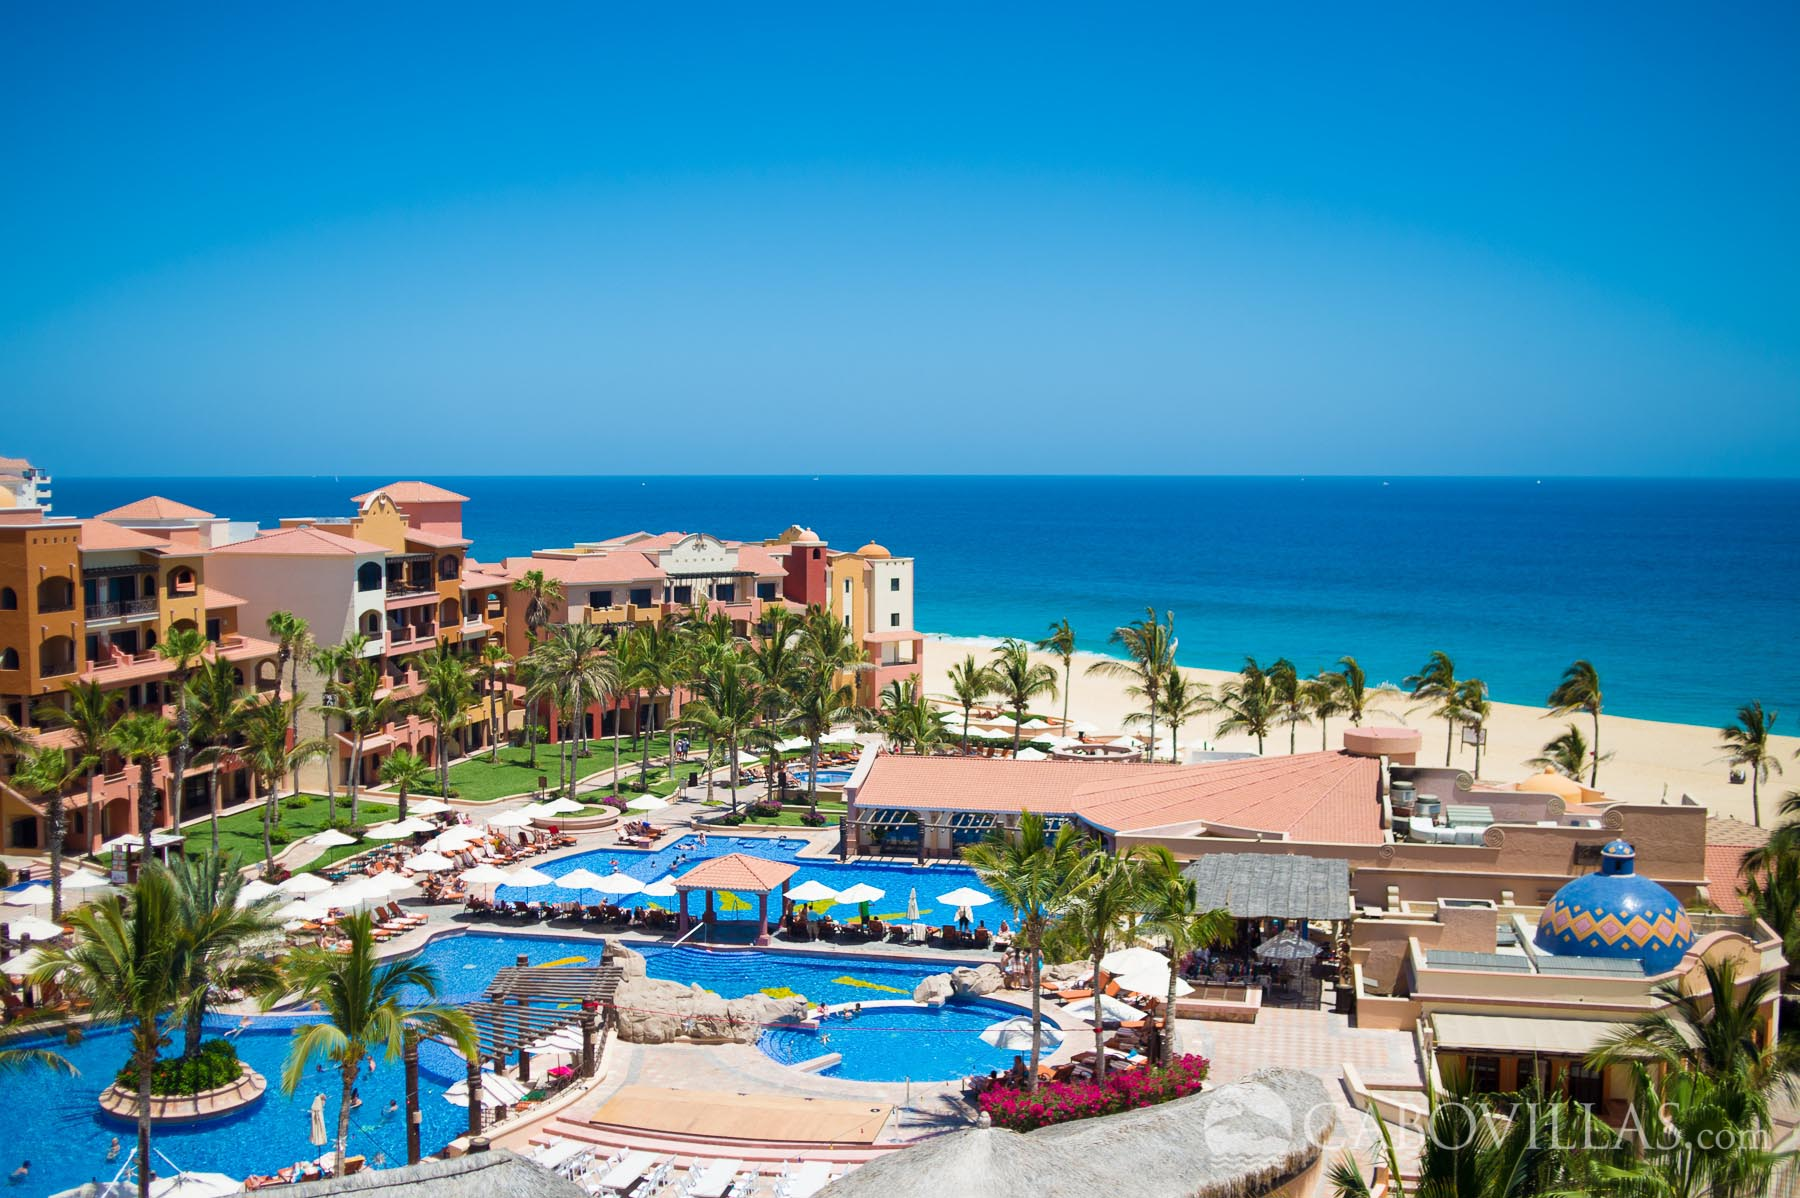 Playa Grande Beach Resort